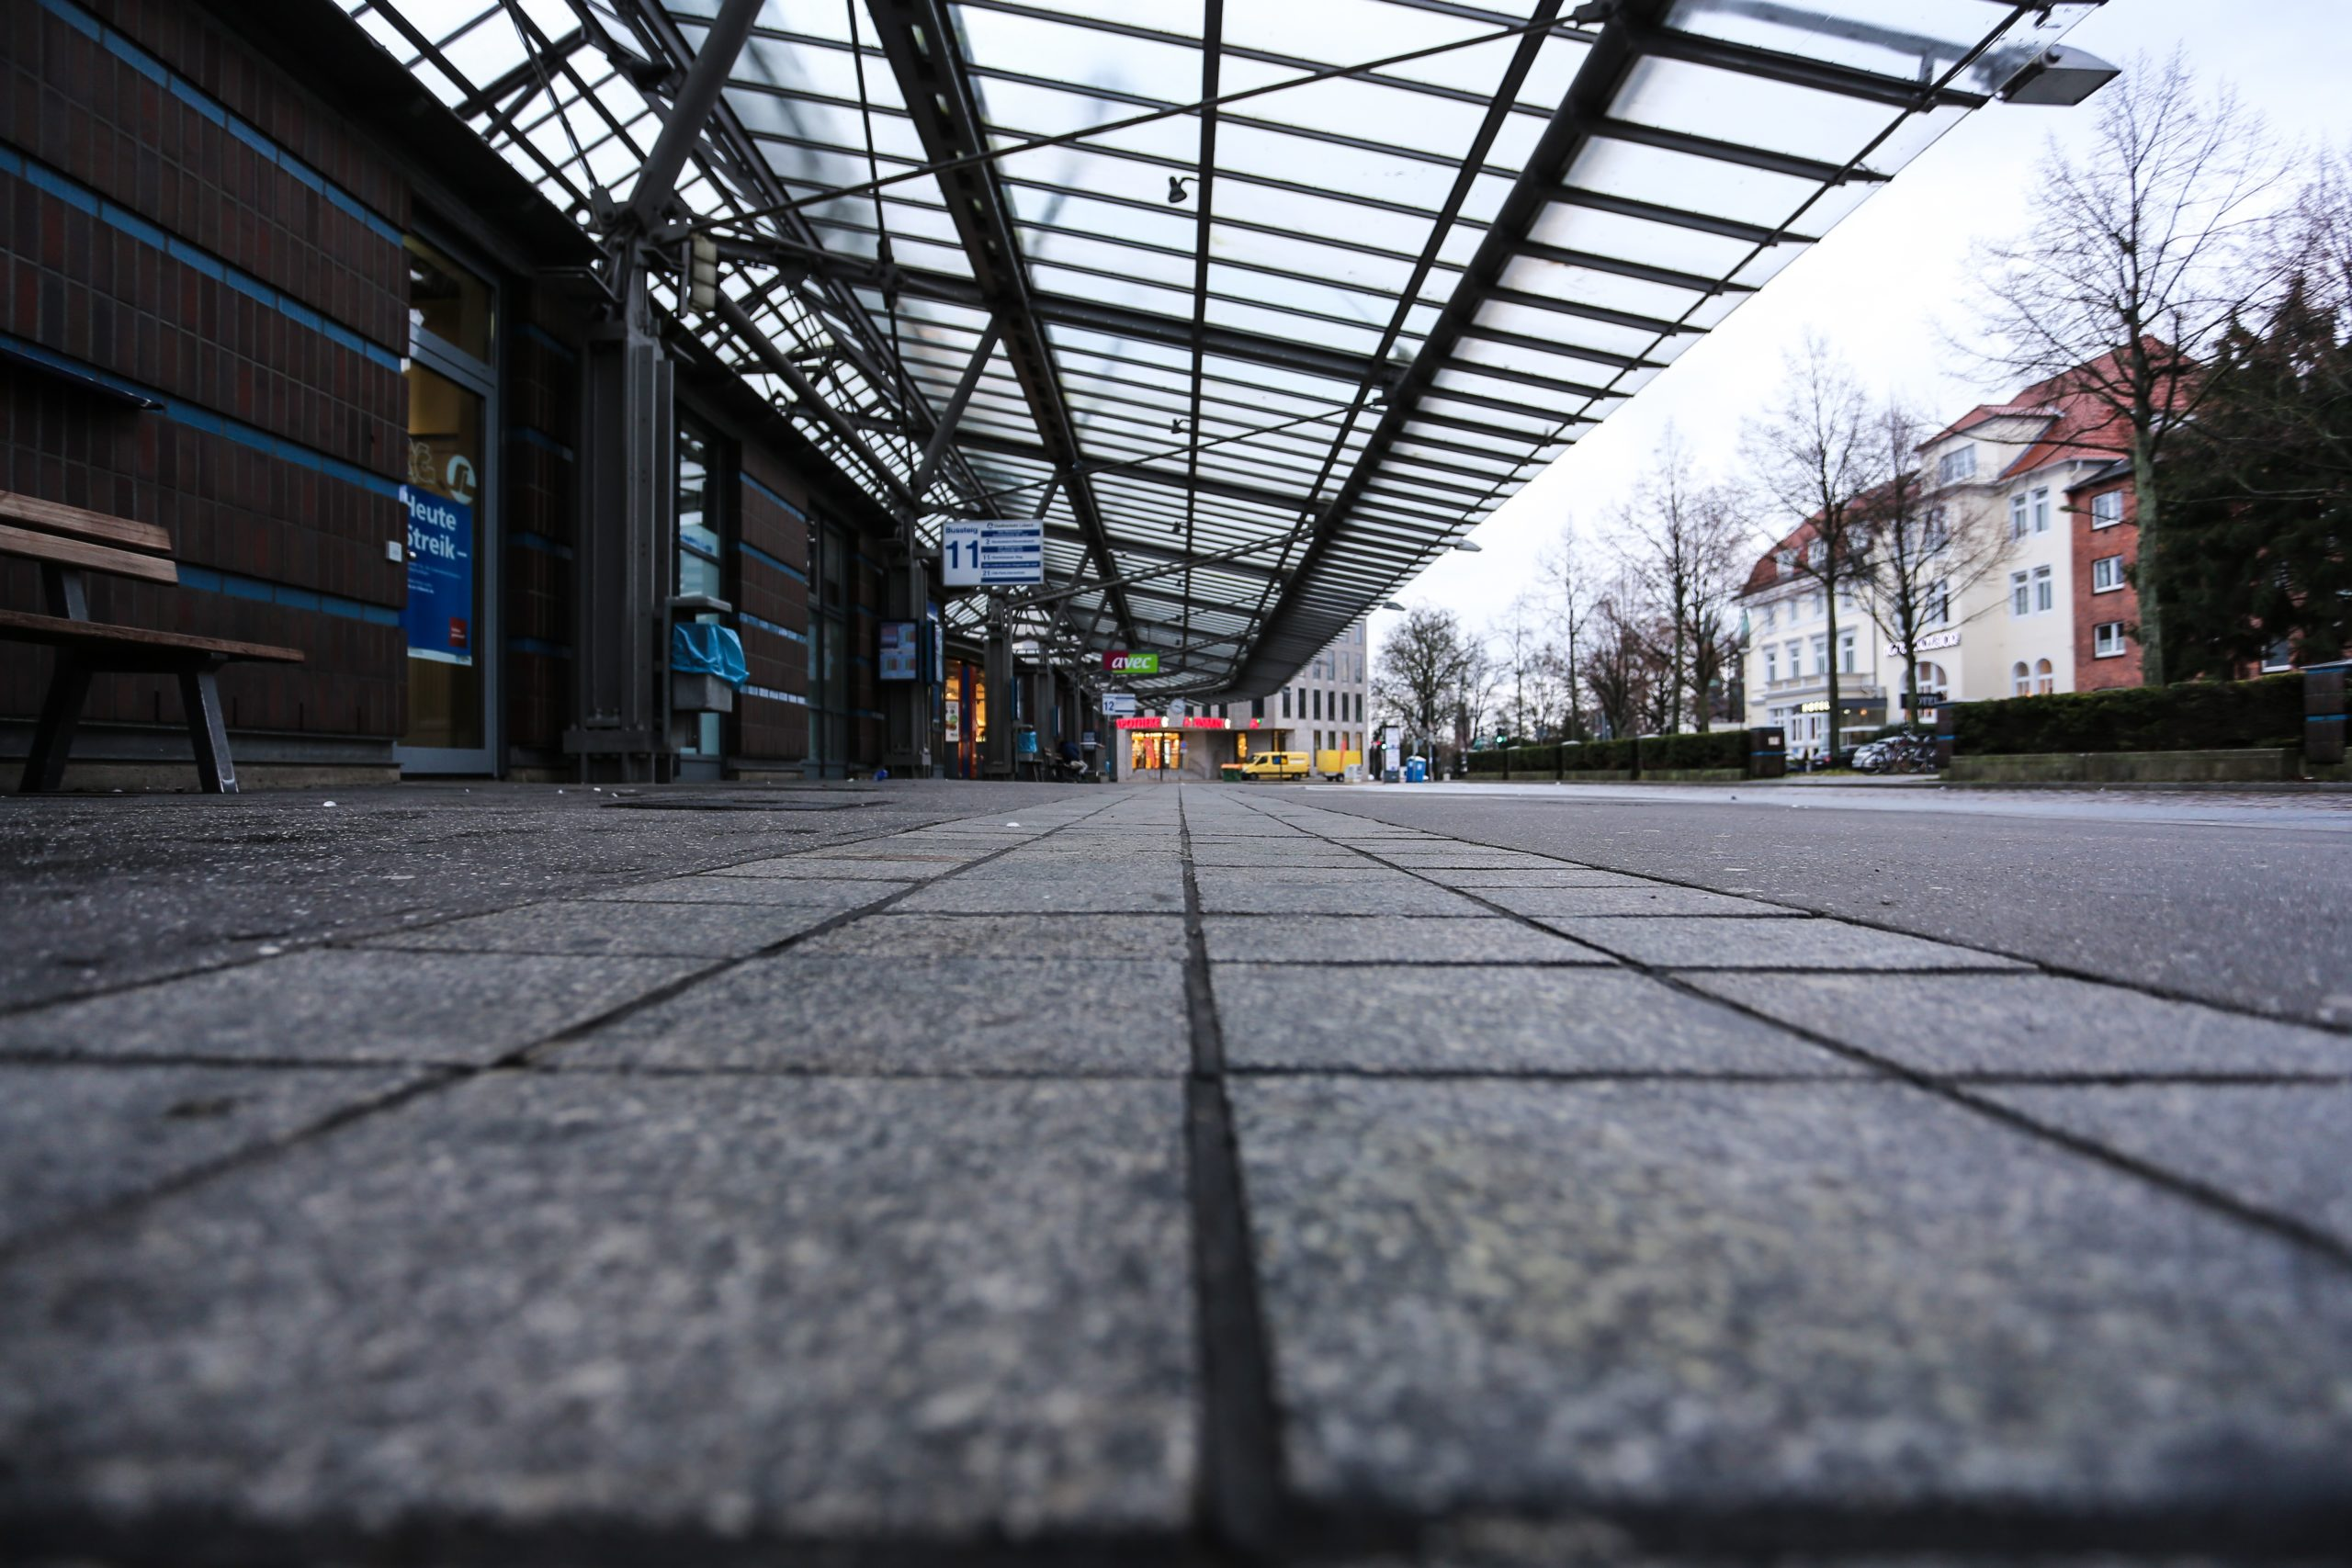 Lübeck Angsträume Angst Umfrage